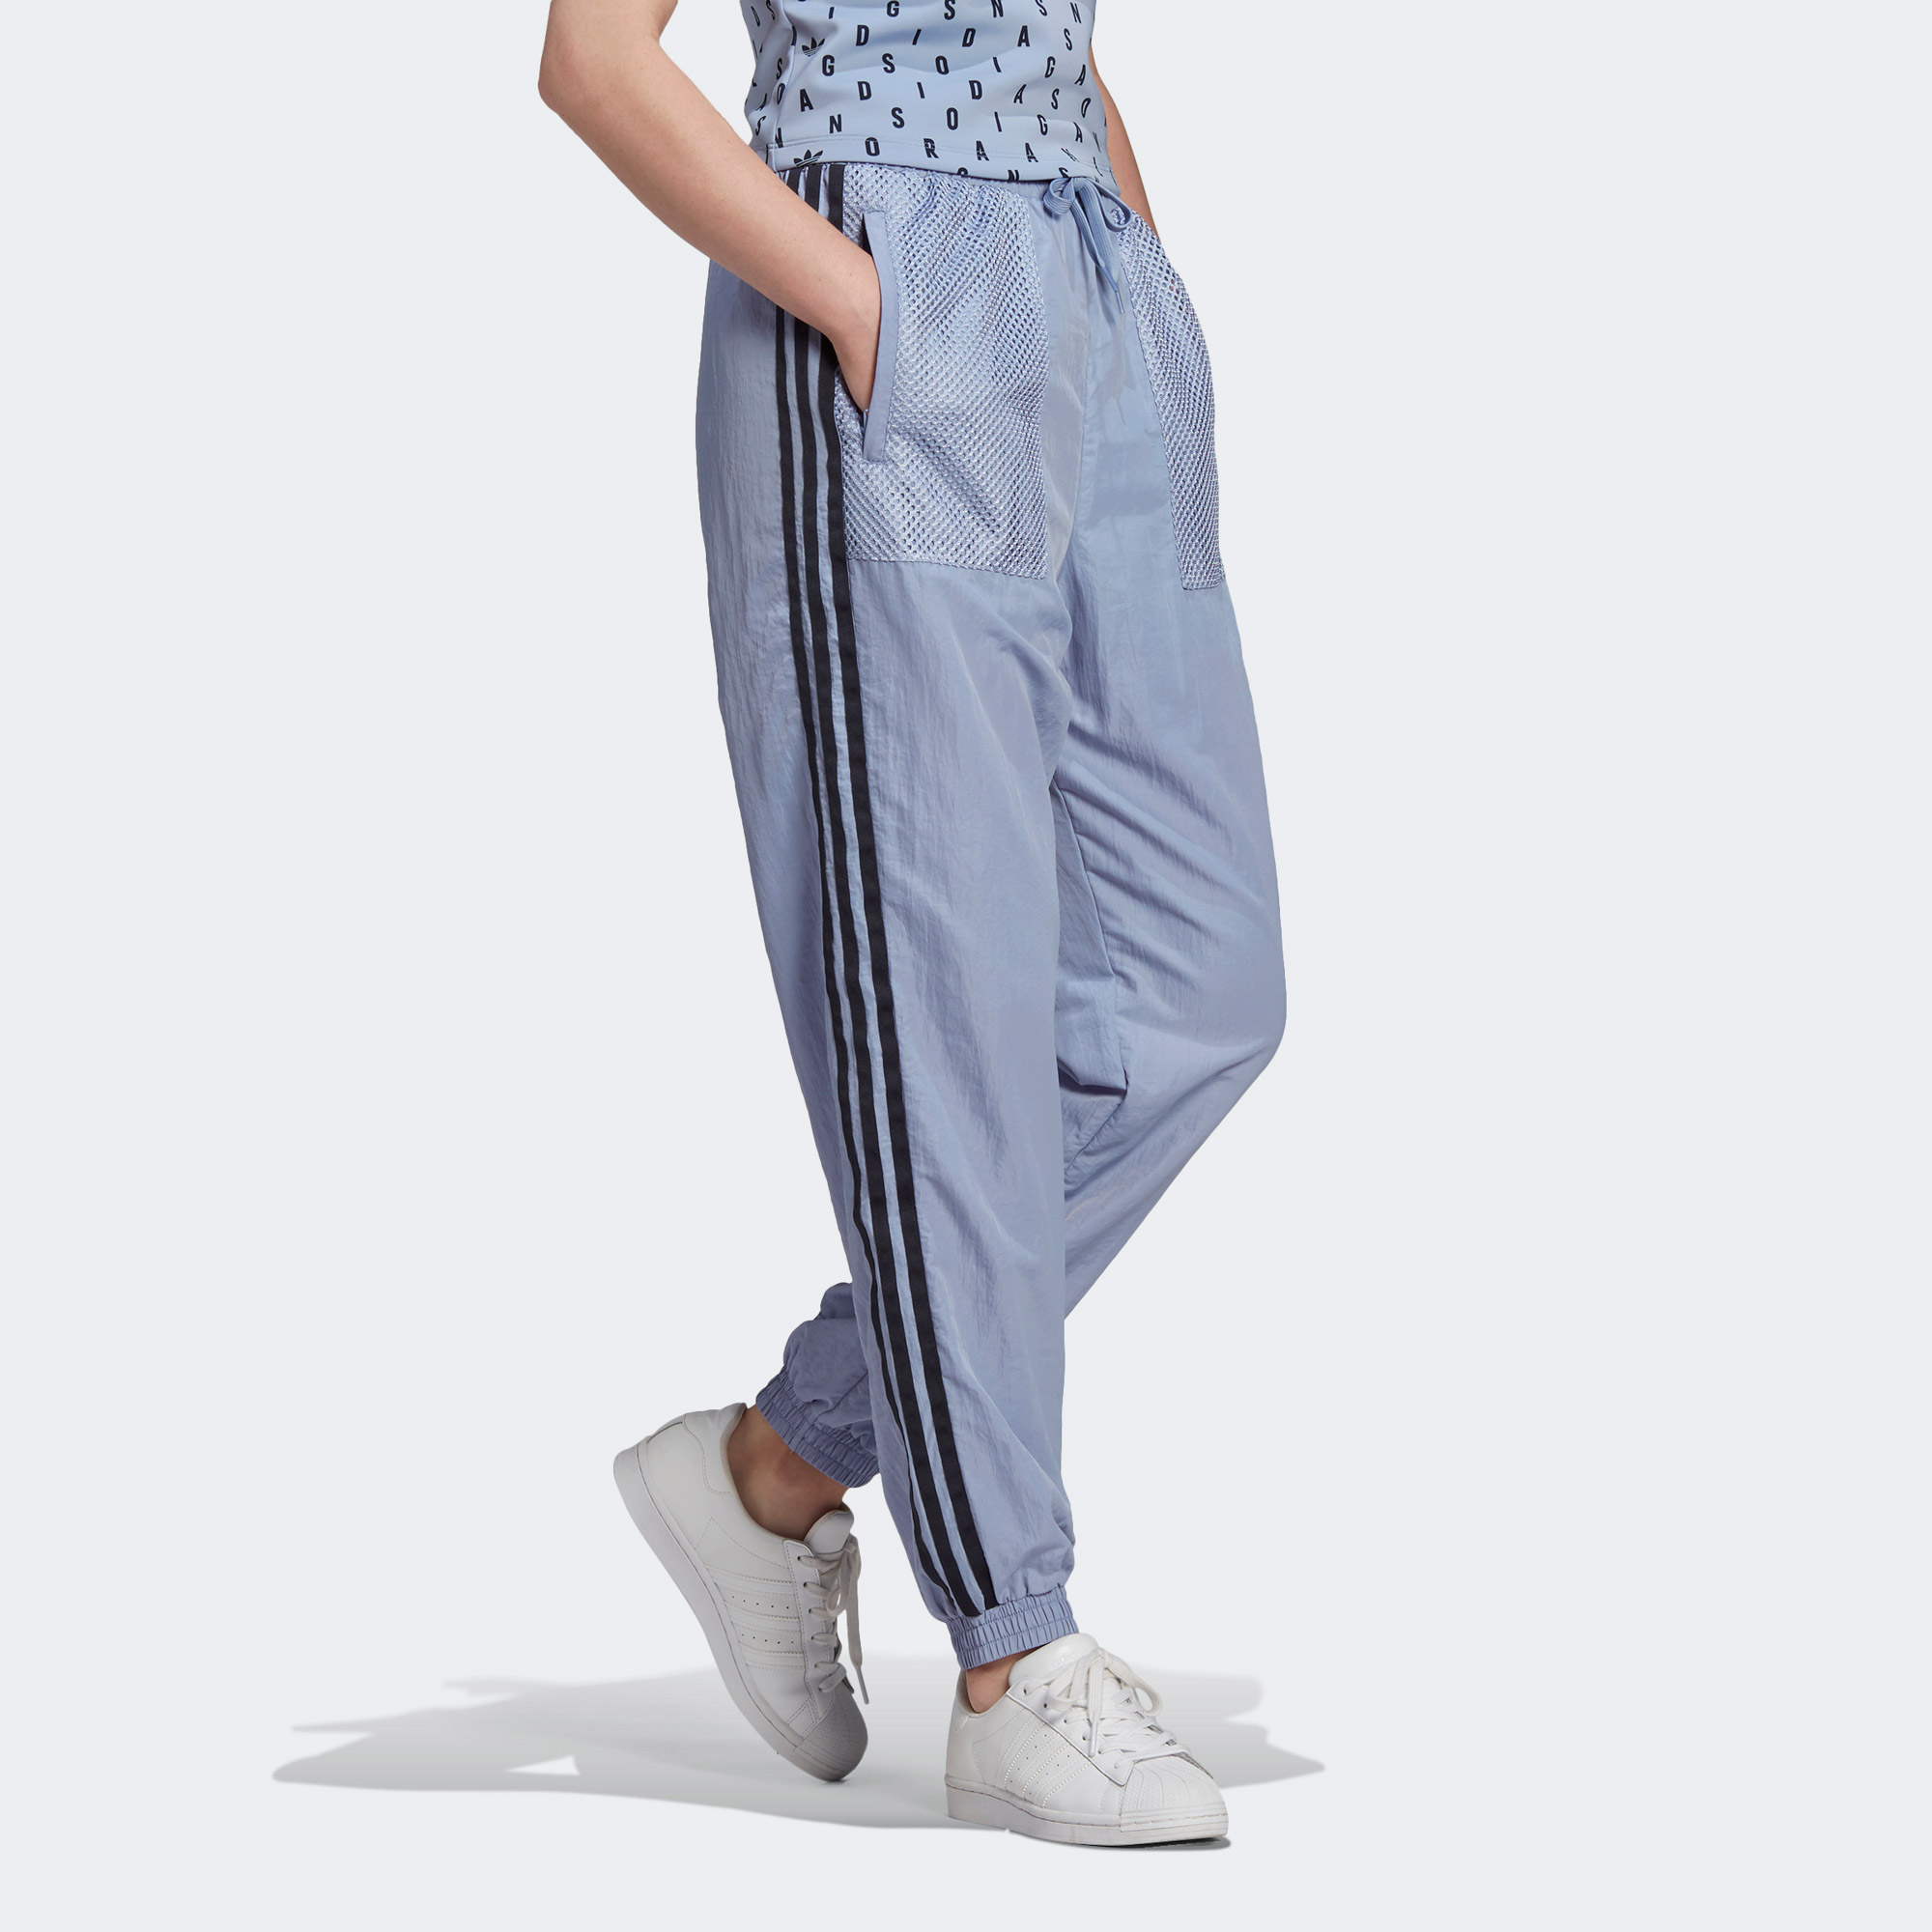 adidas Nylon Pant Kadın Mavi Eşofman Altı